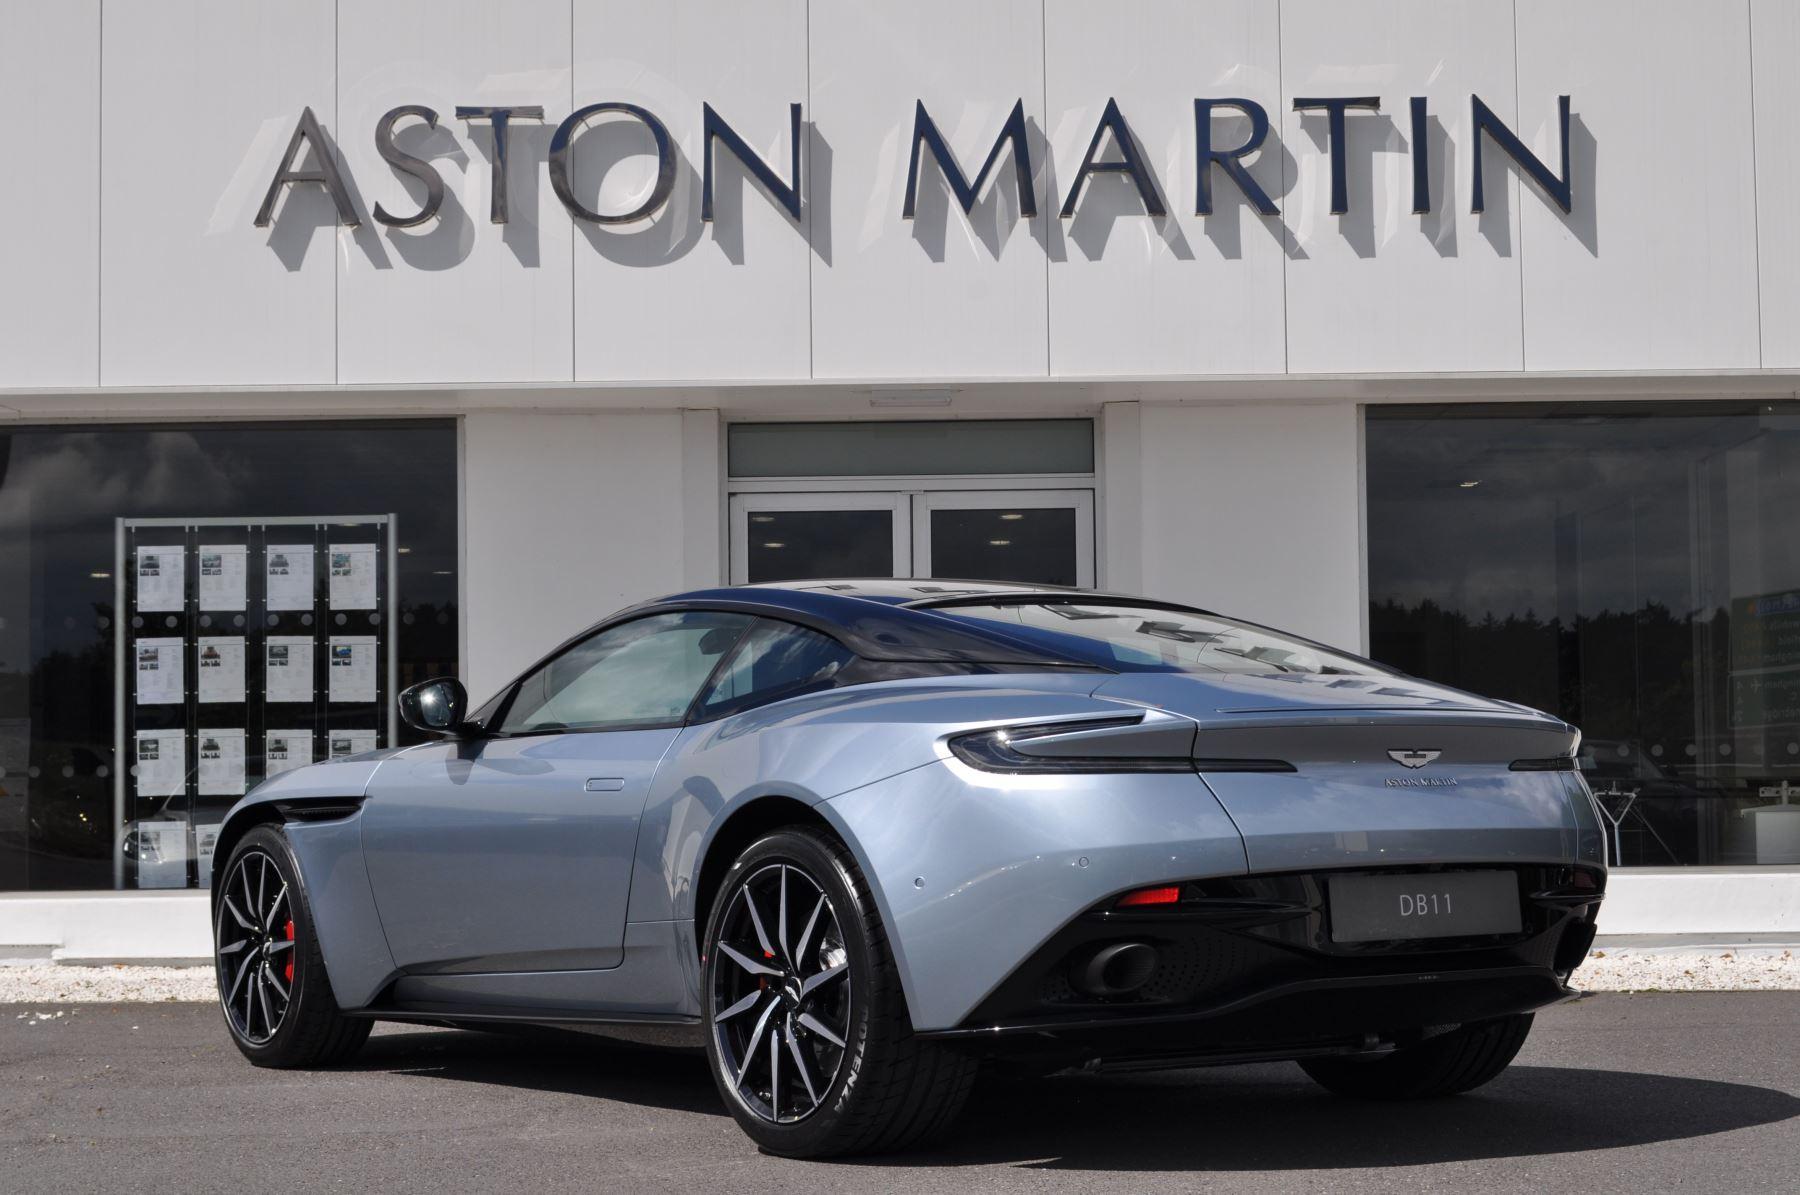 Aston Martin DB11 V8 Touchtronic image 5